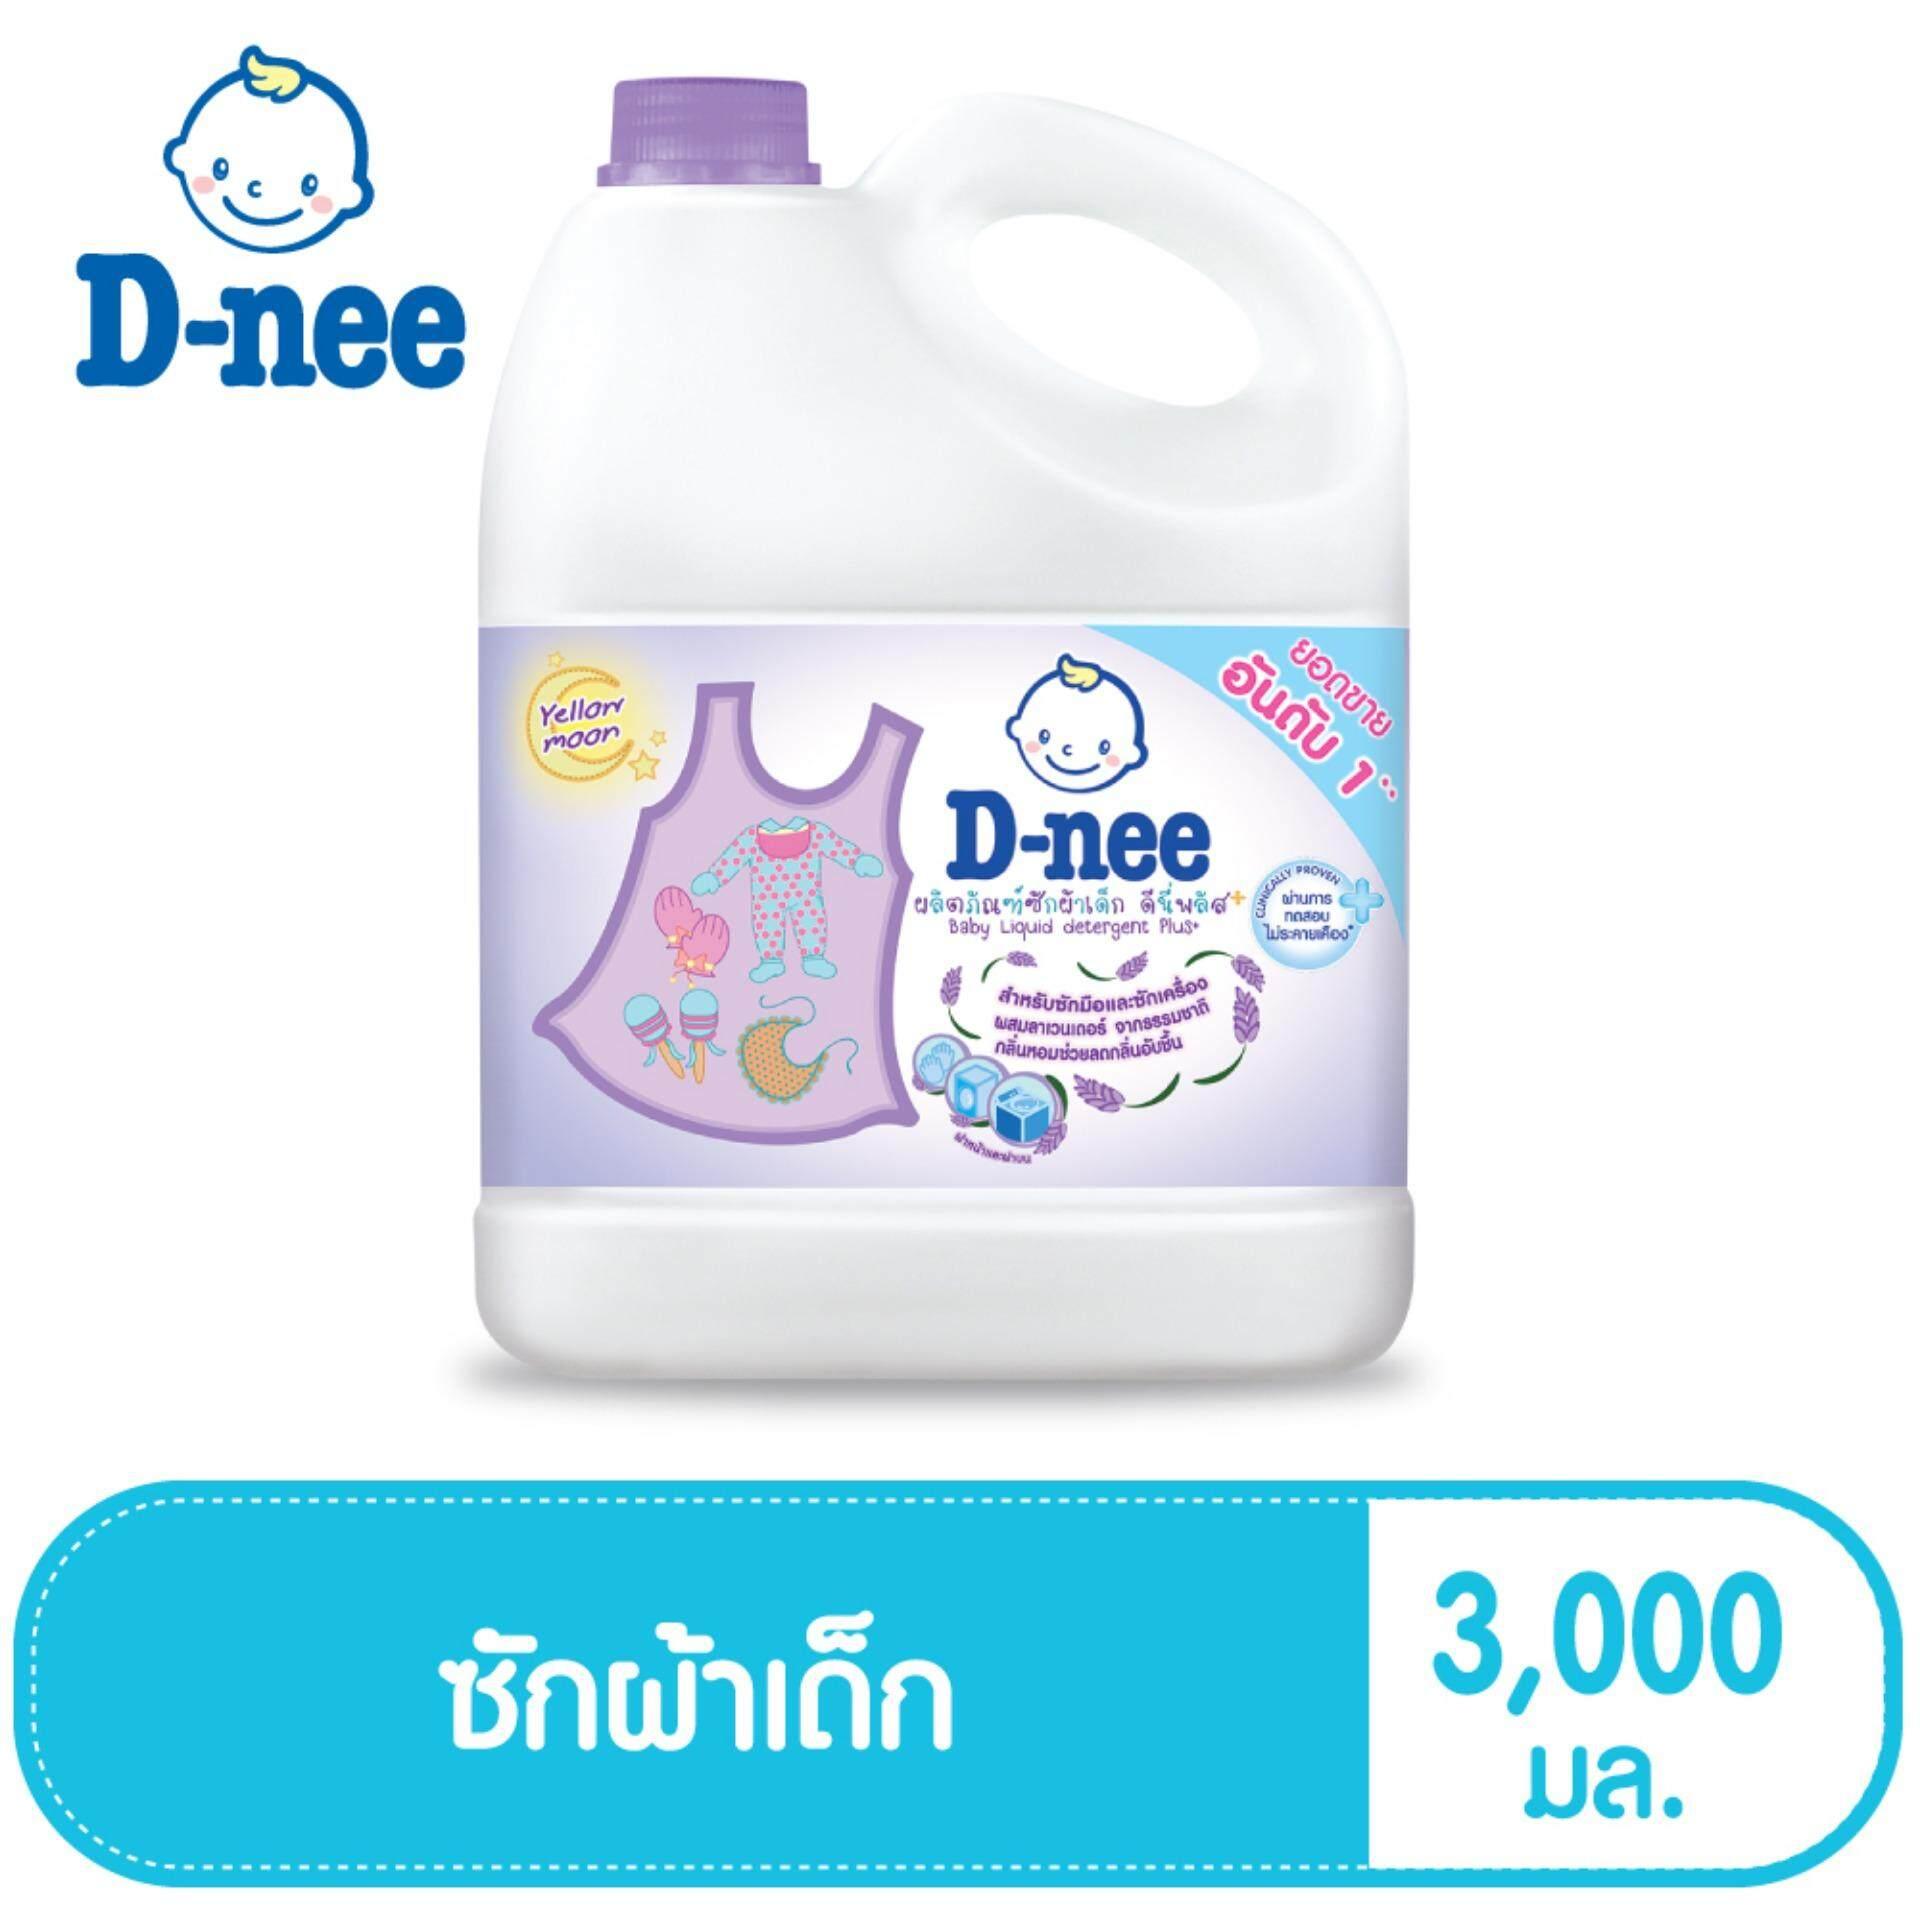 D-Nee น้ำยาซักผ้าเด็ก กลิ่น Yellow Moon แบบแกลลอน ขนาด 3000 มล. By Lazada Retail D-Nee.